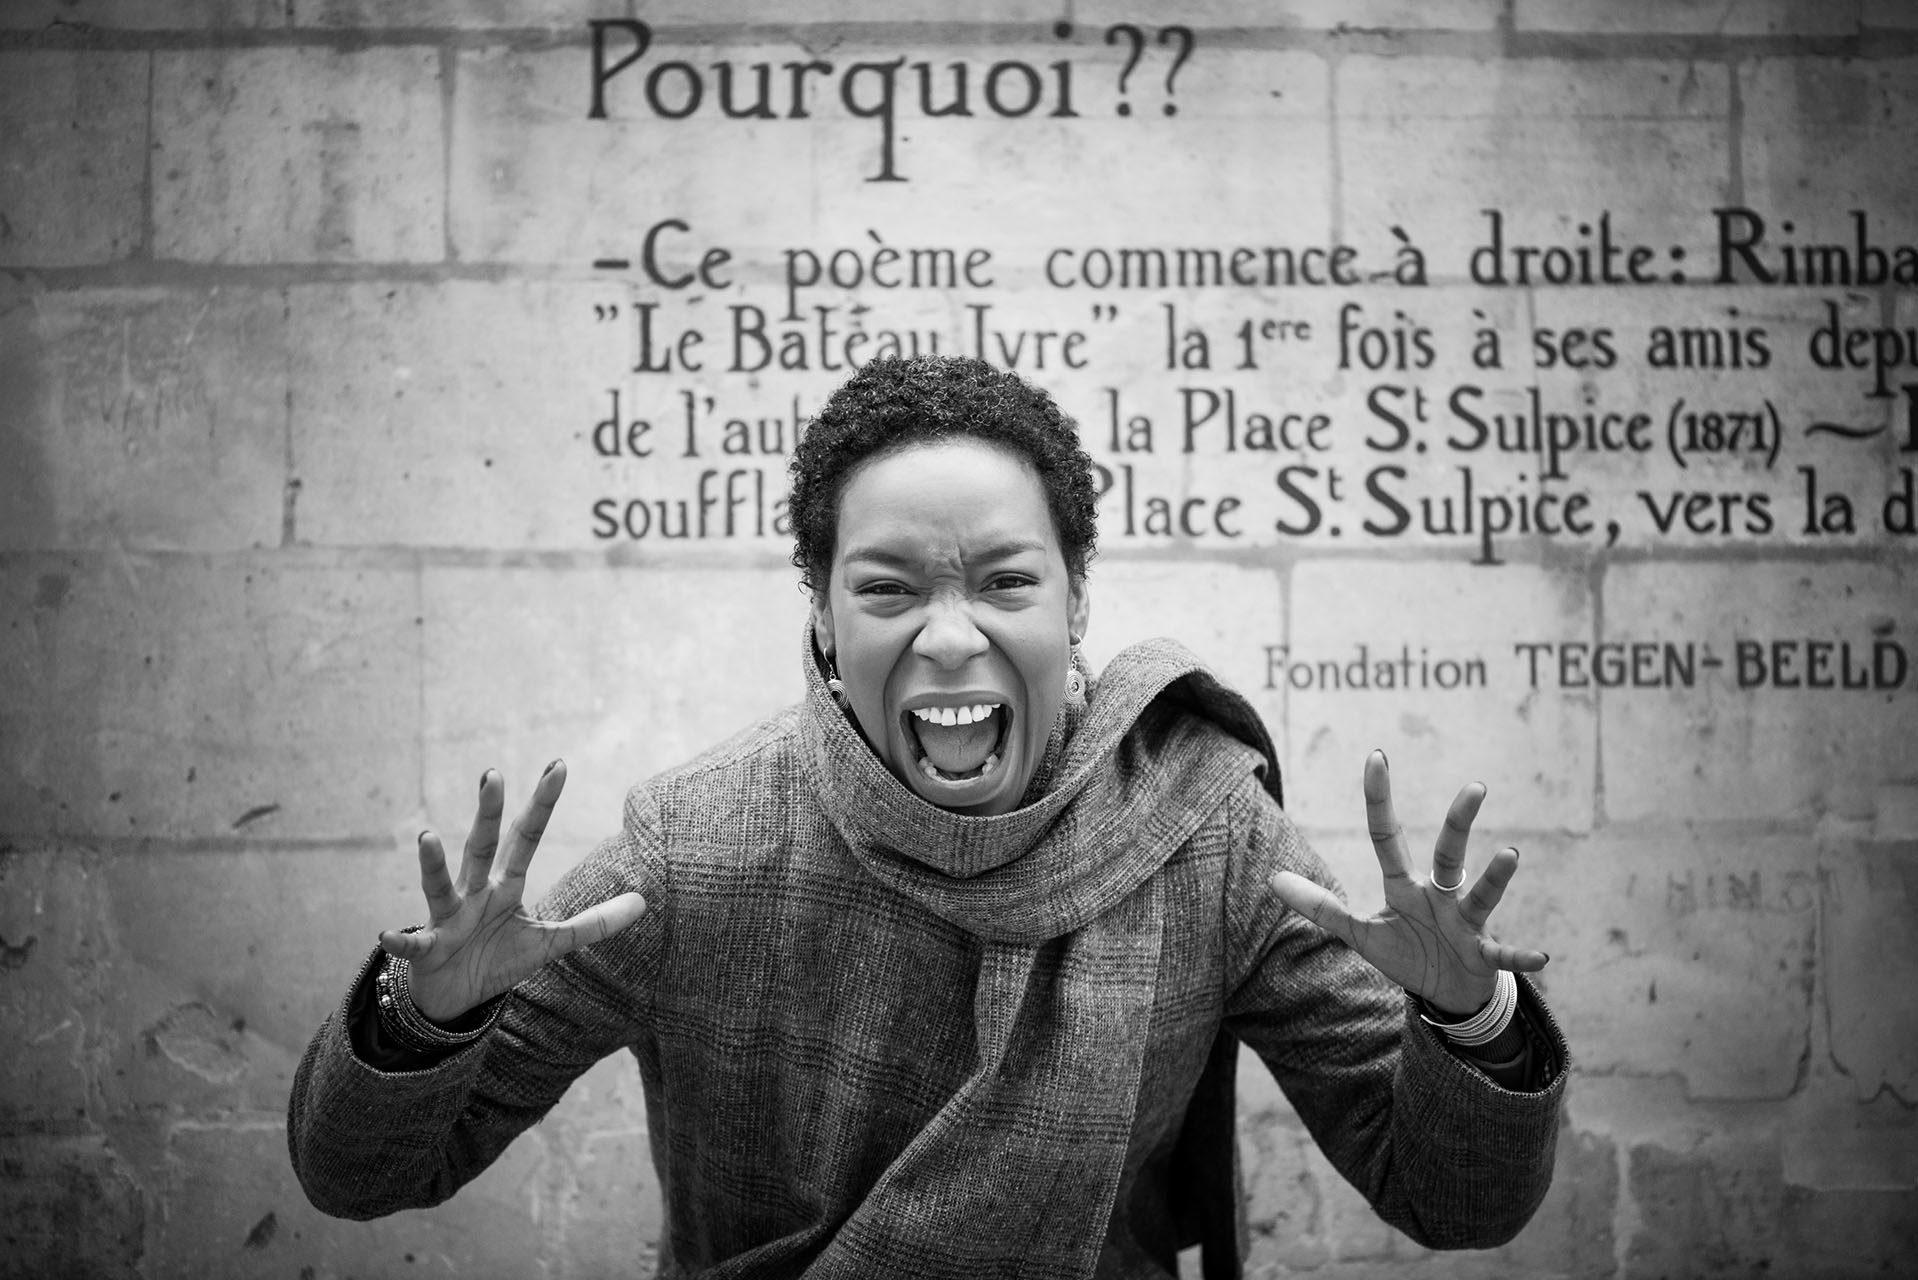 photographe-portraits-maya-angelsen-ile-de-france-seine-saint-denis-mai